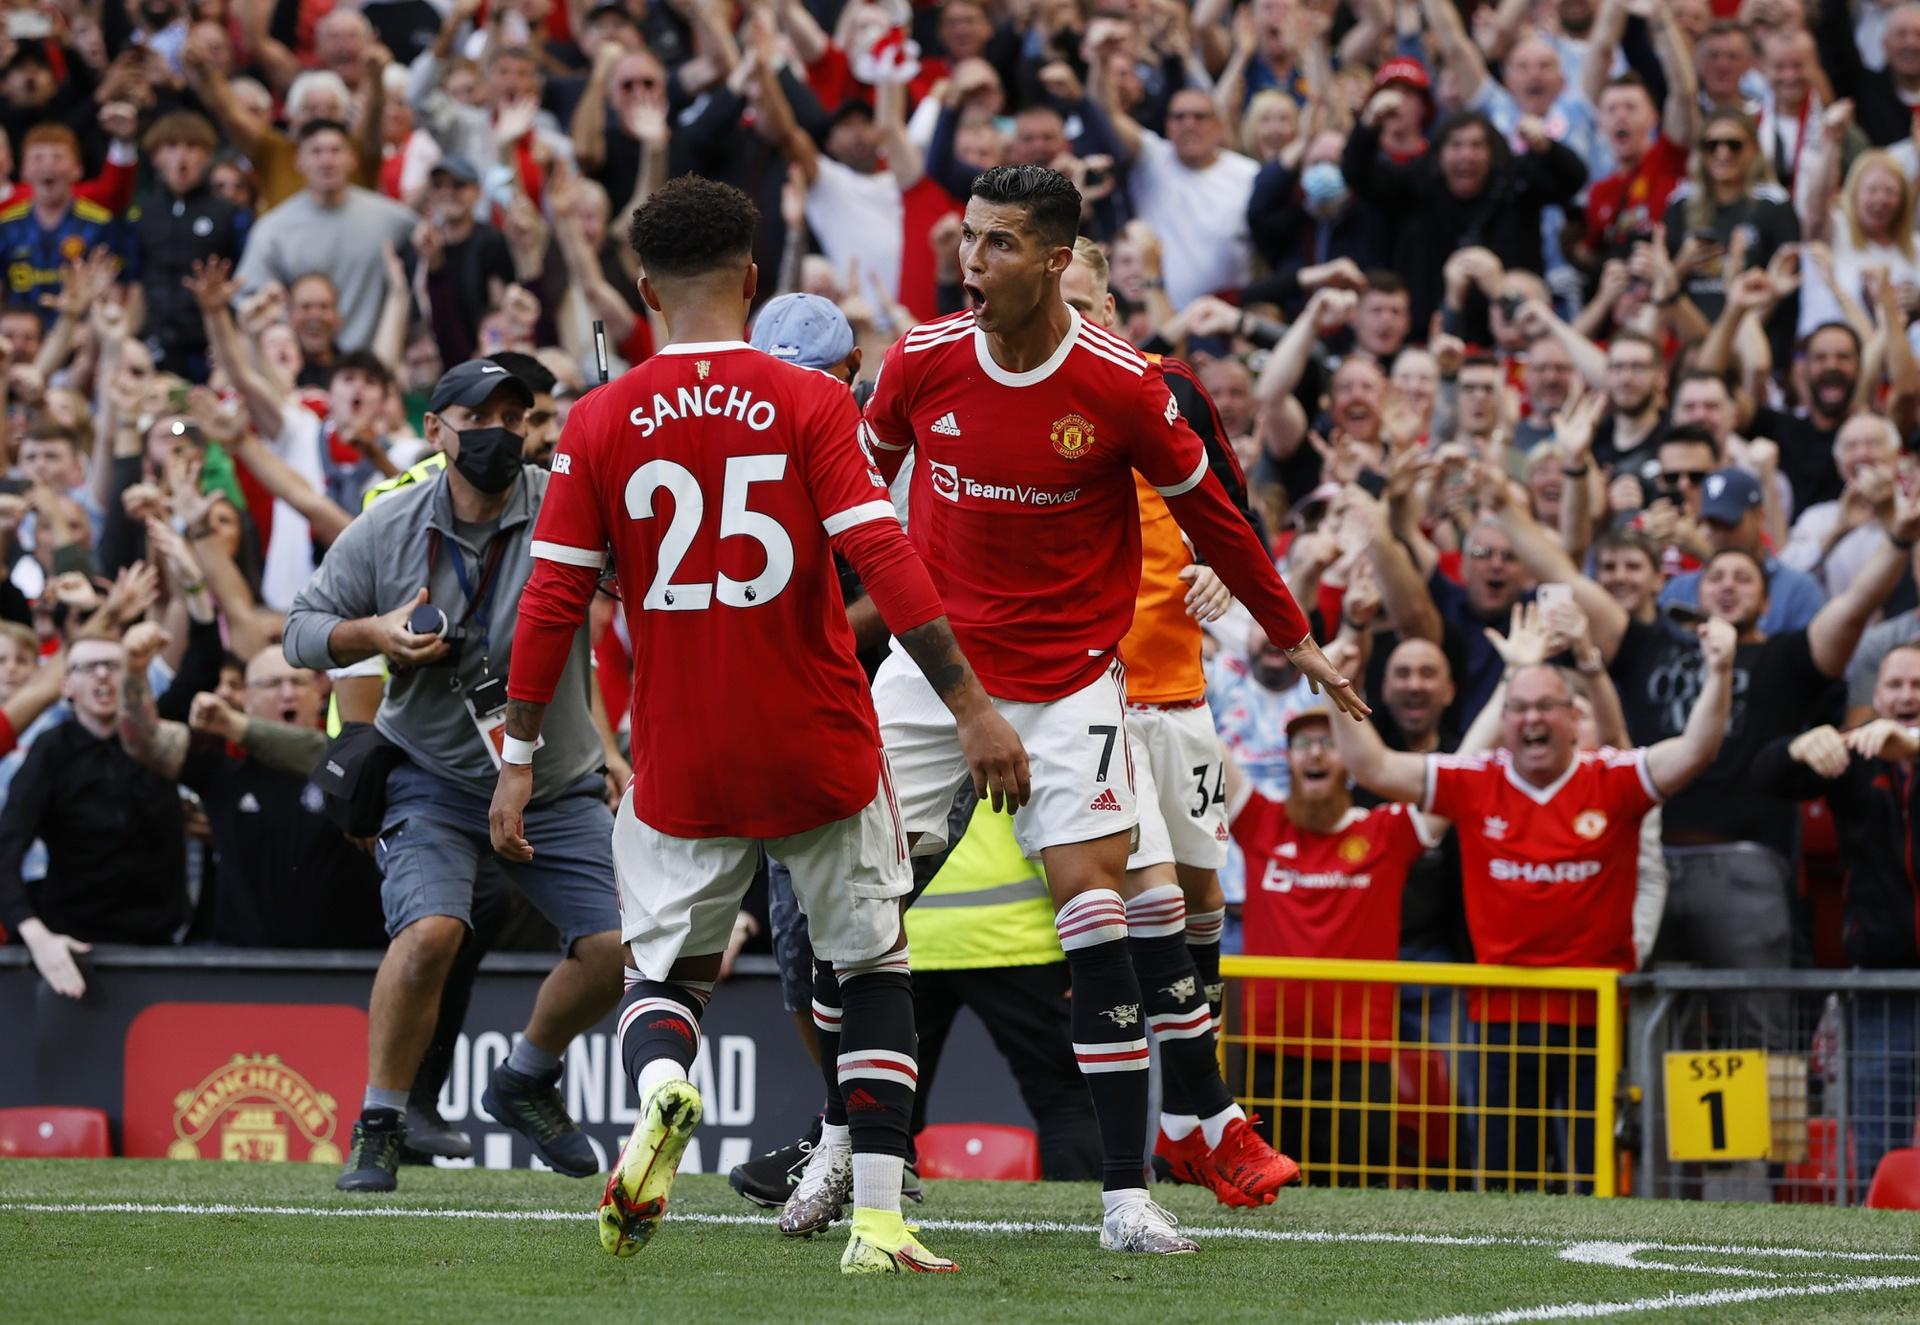 Gary Neville does not expect Ronaldo to turn Man Utd into champions this season - Bóng Đá